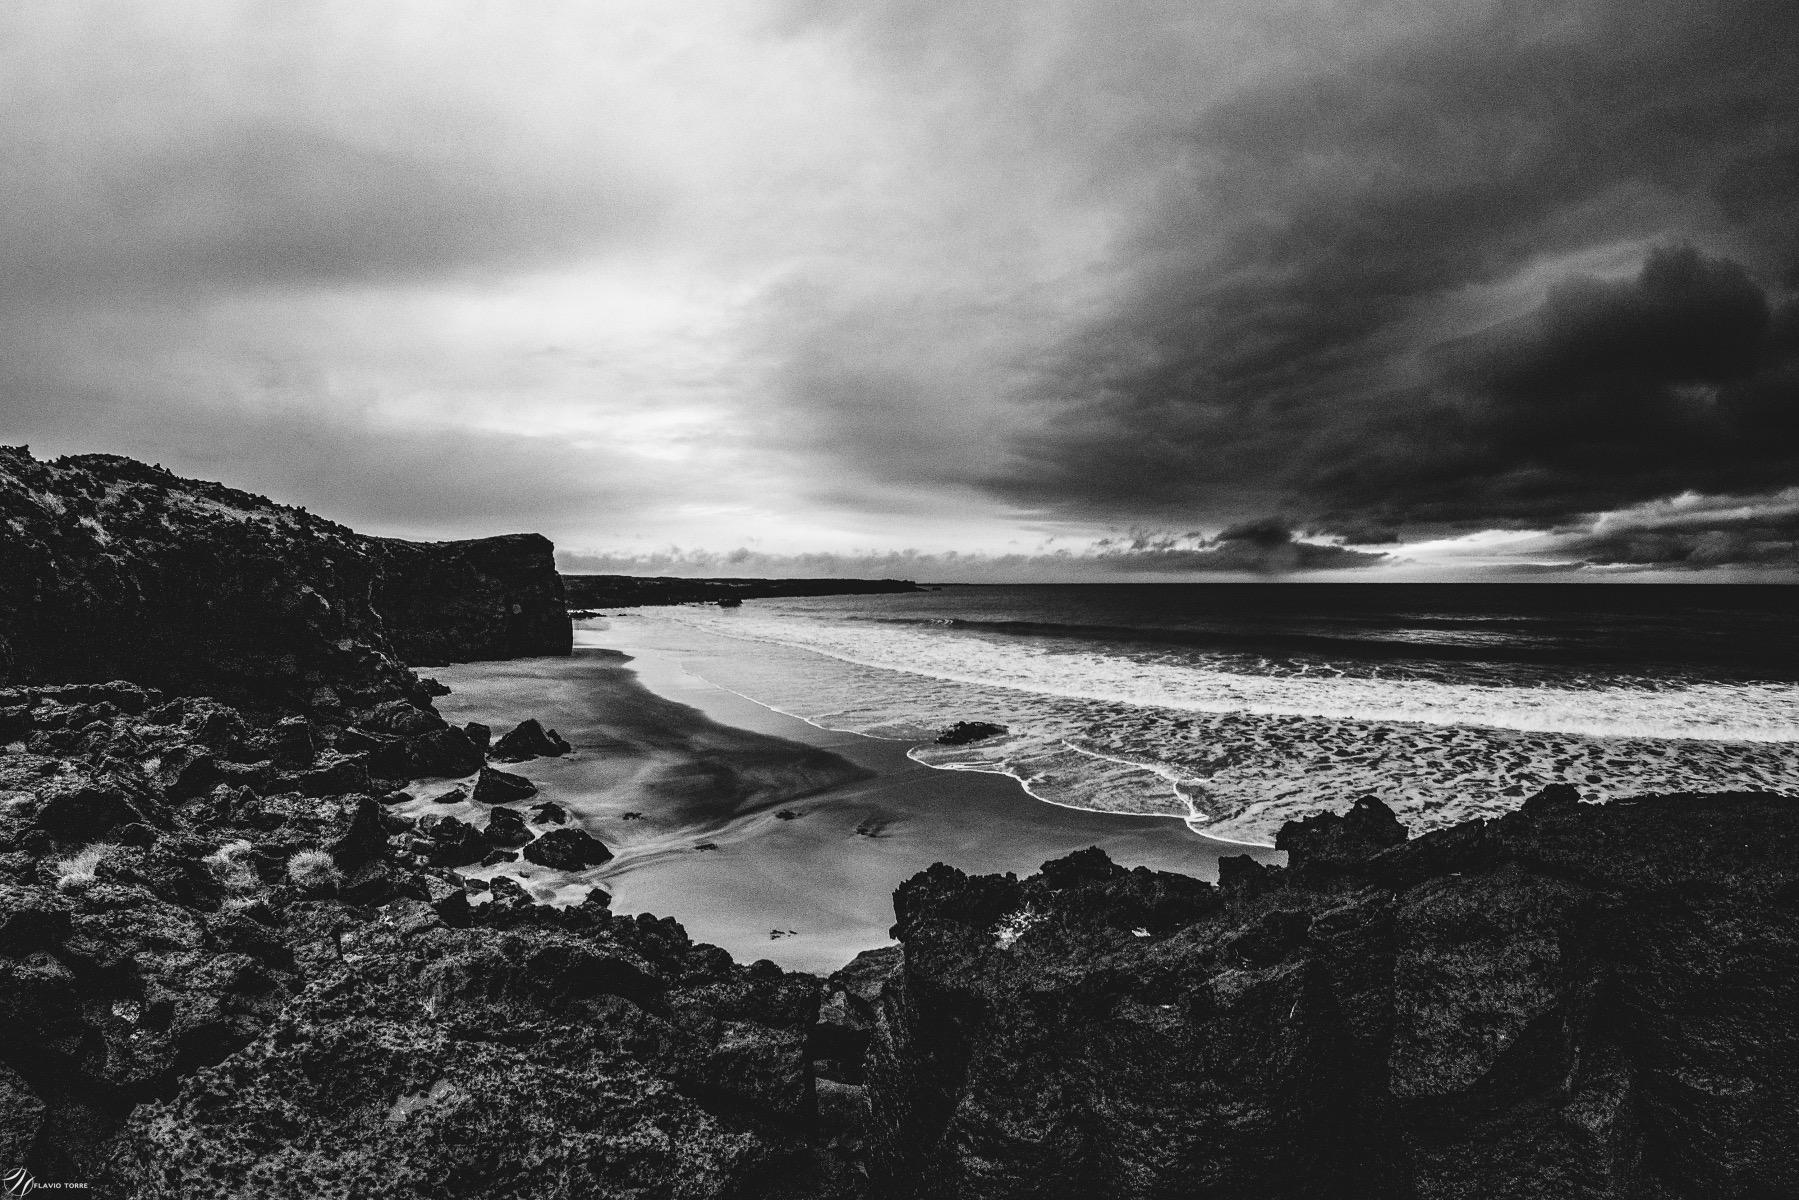 Categories: Fine Art Landscape & Nature Reportage; Categories: Fine Art Landscape & Nature Reportage; Ph. FLAVIO TORRE; Location: Iceland